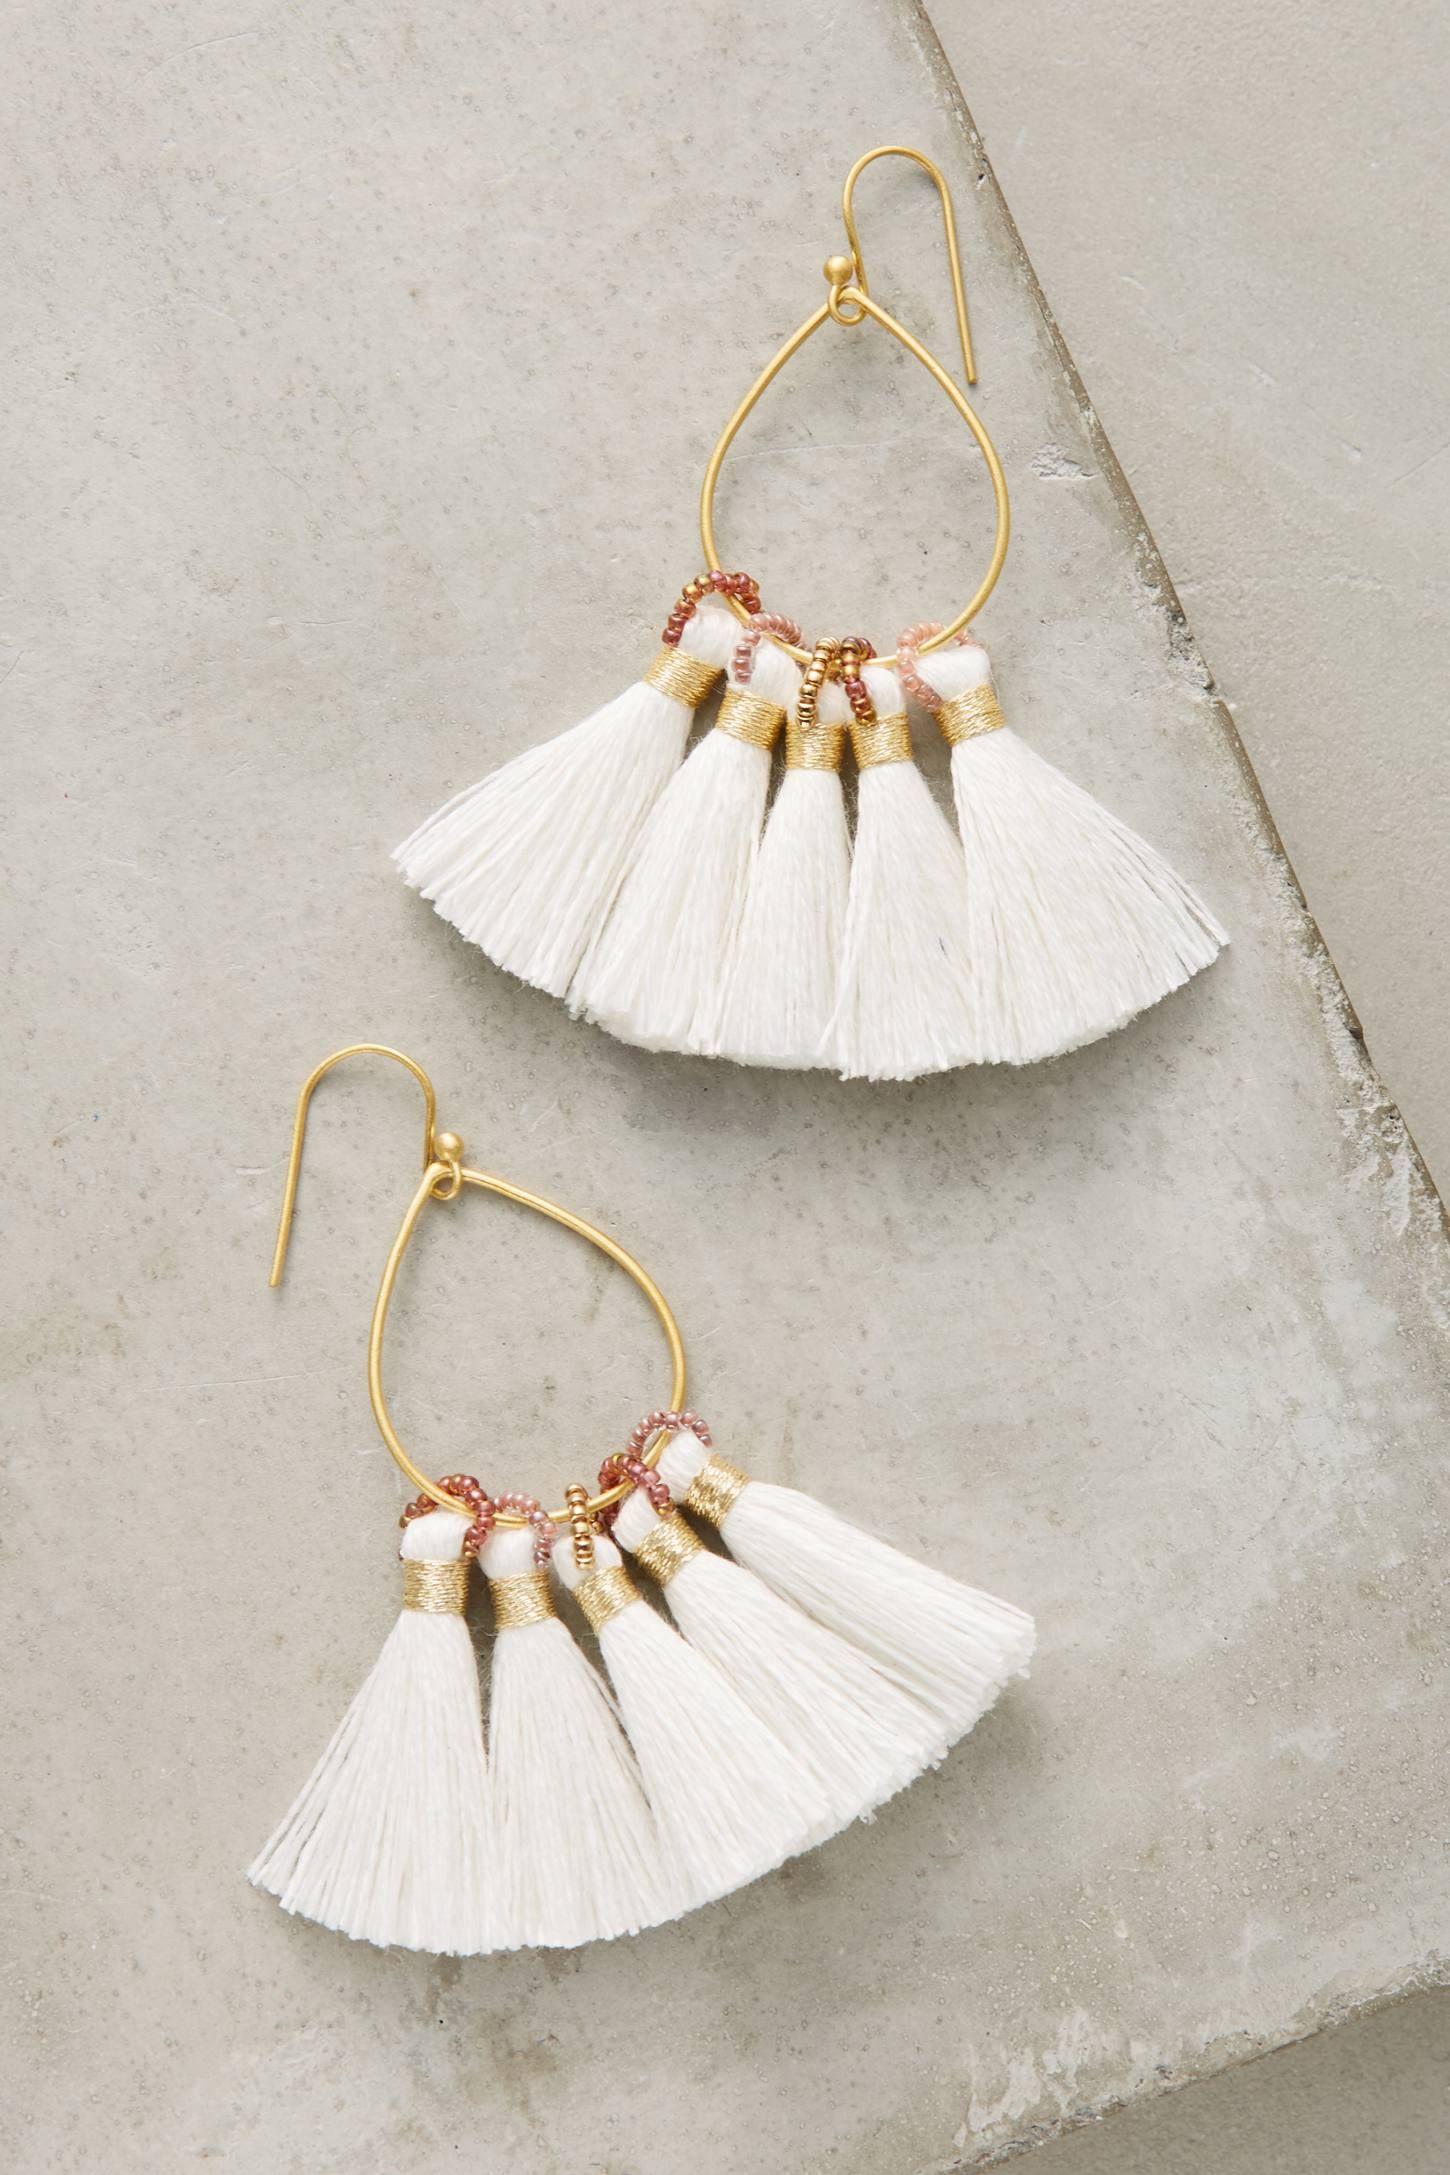 jolie tassel earrings | tassel earrings, anthropologie and tassels